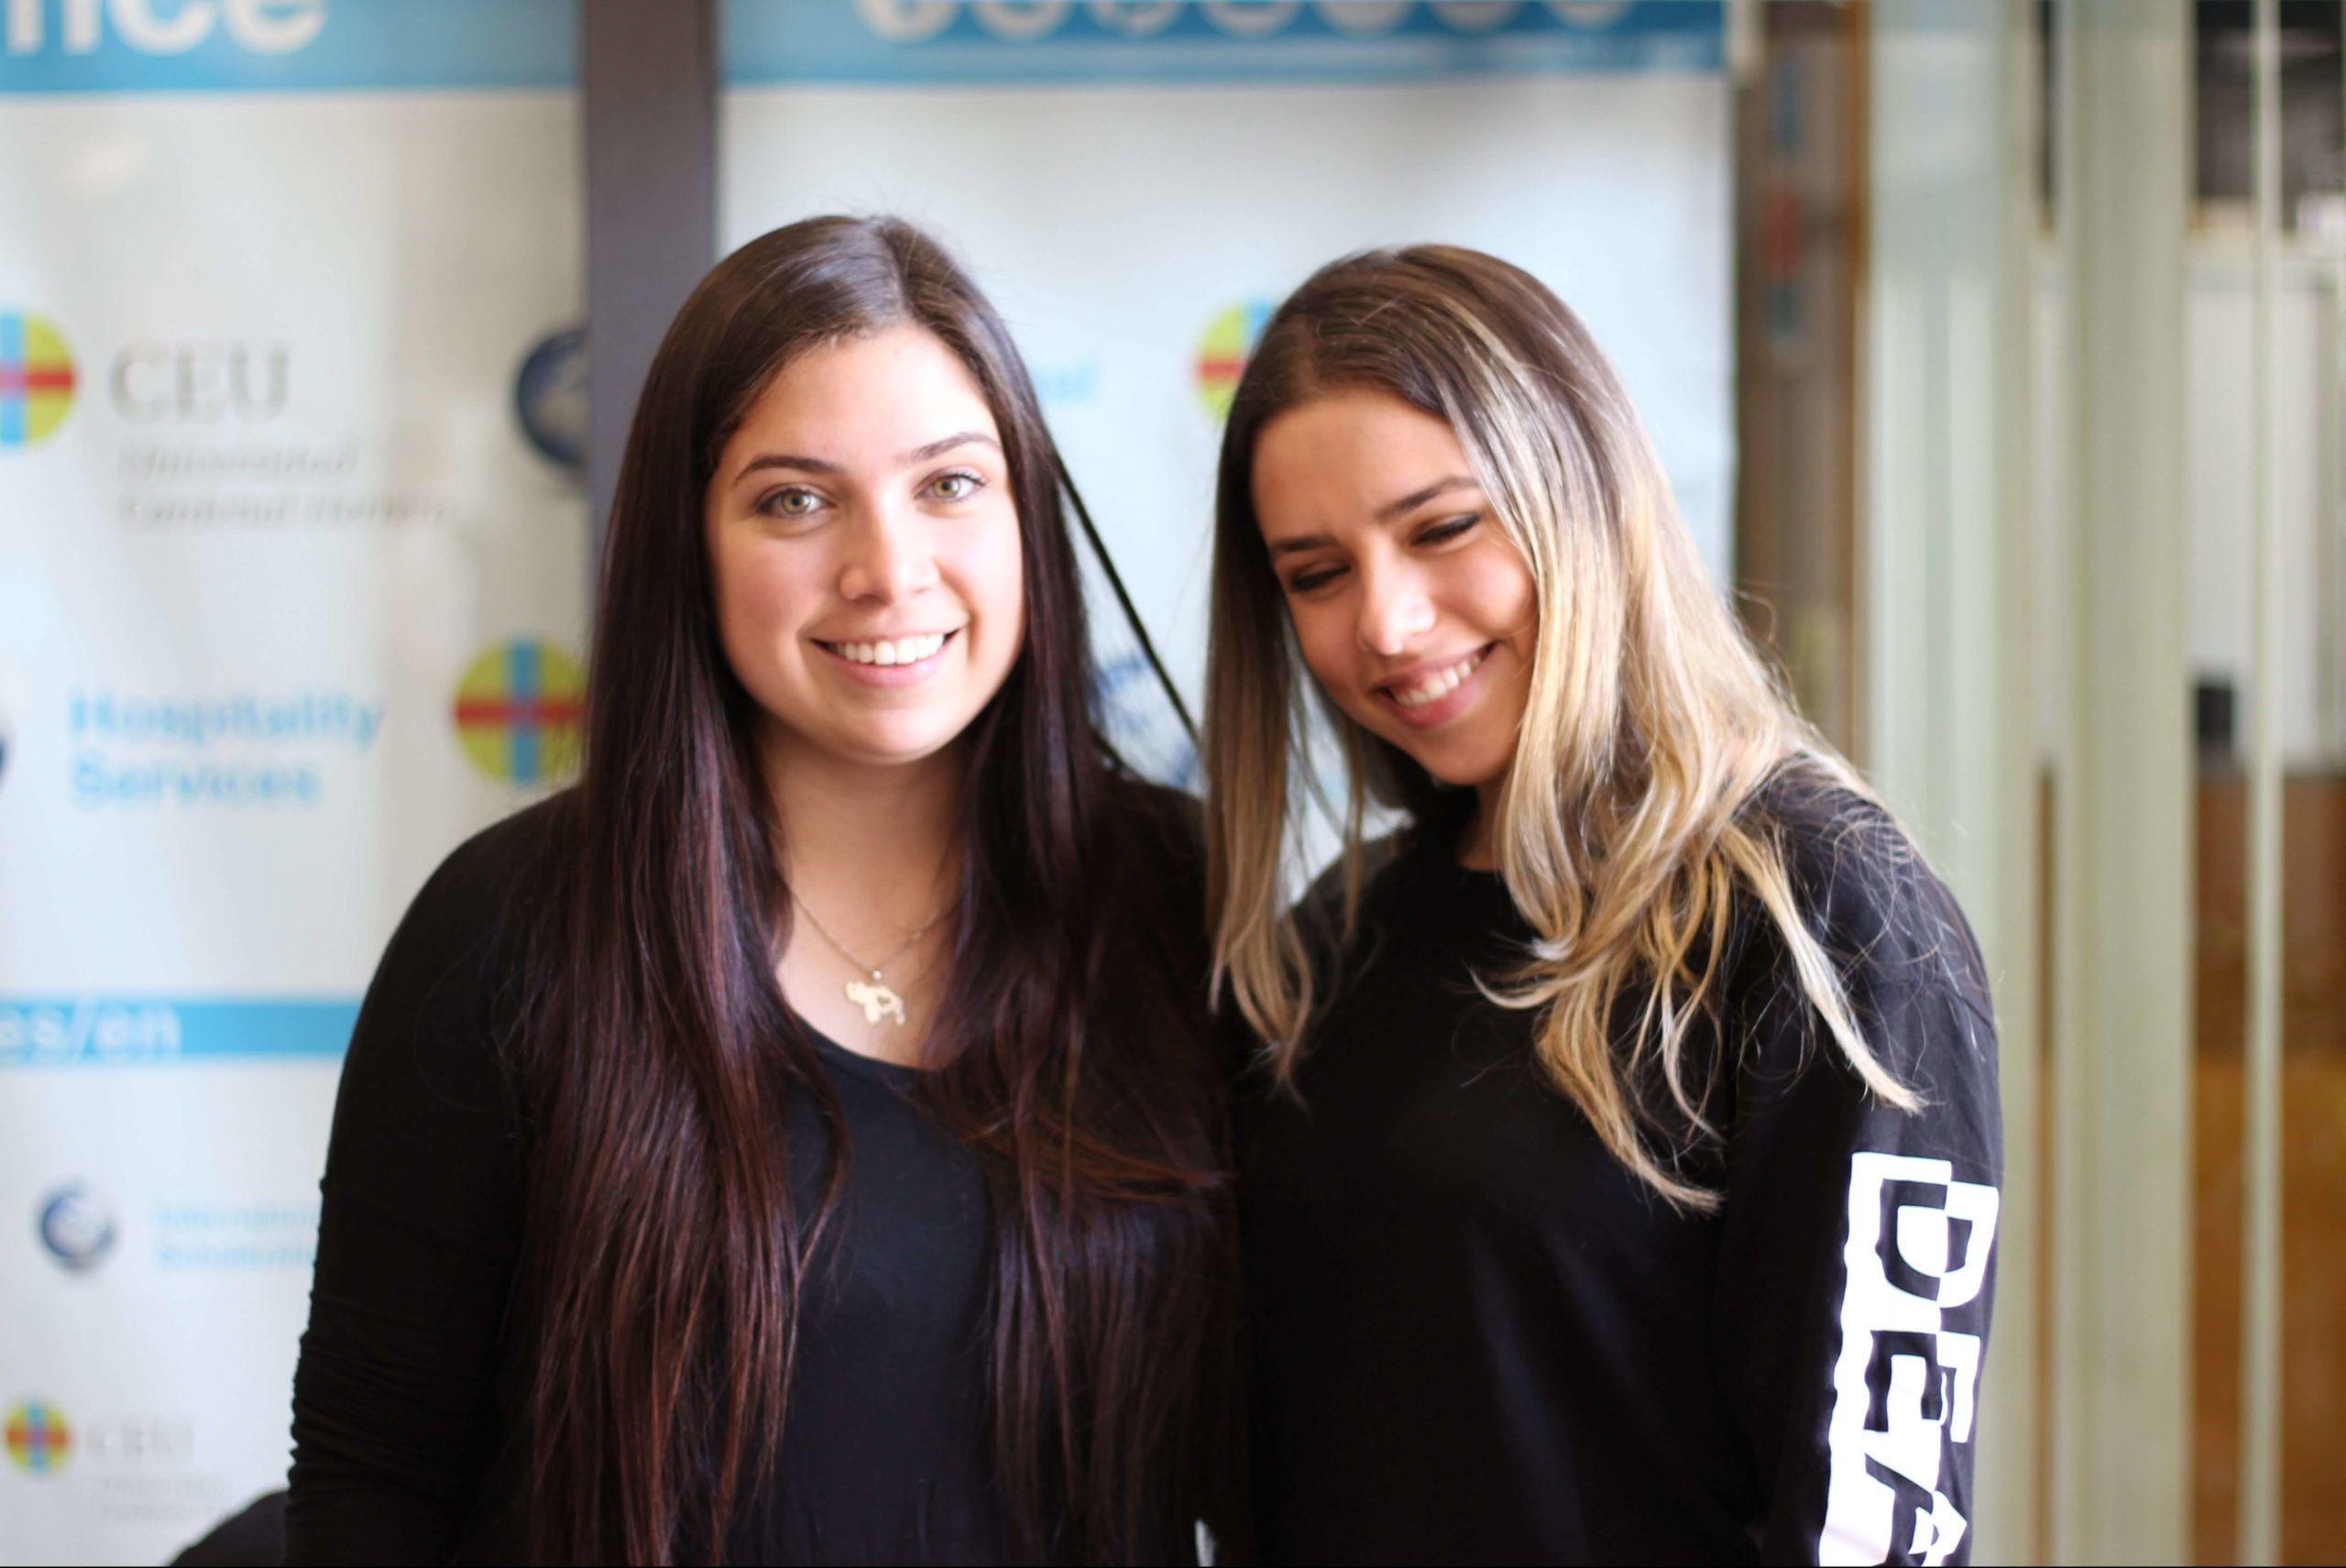 Maite and Andrea, both from Venezuela, finally met at CEU!